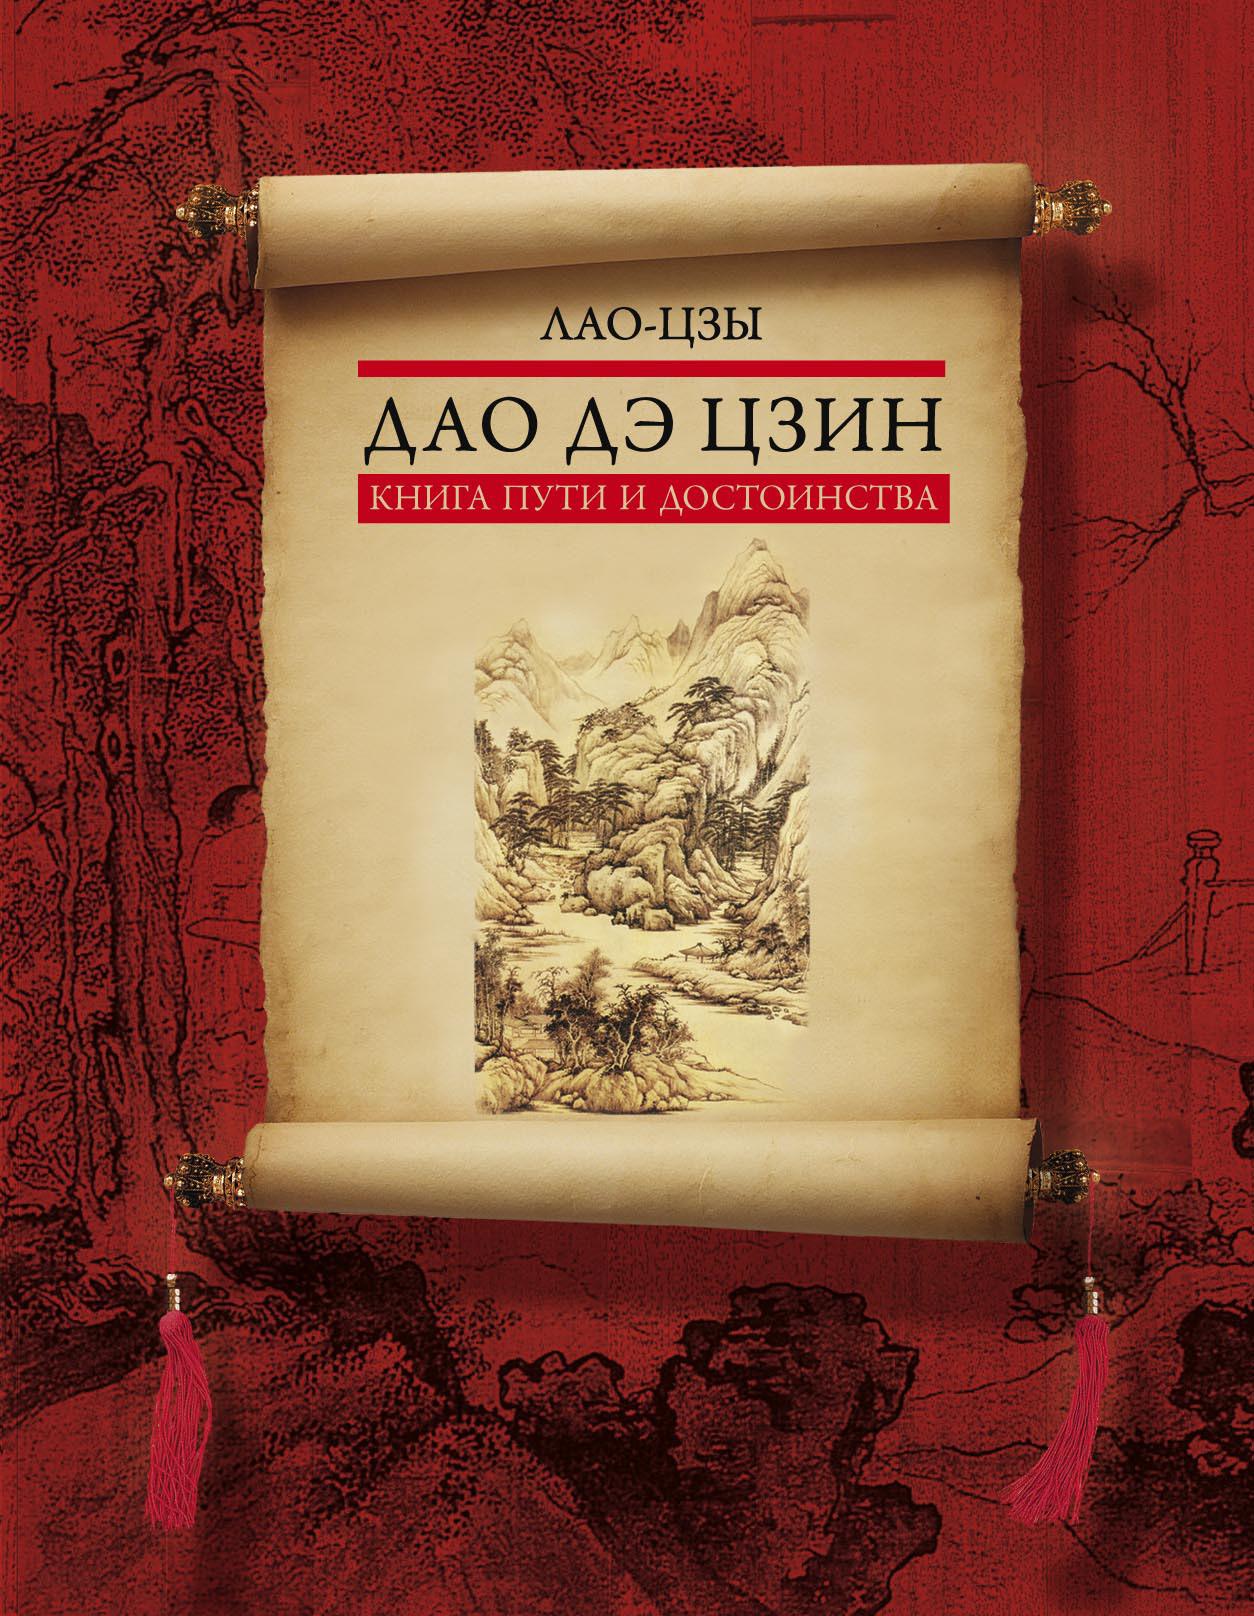 Лао-цзы Дао дэ цзин. Книга пути и достоинства премиум лао цун шуй сиань уи старый буш улун